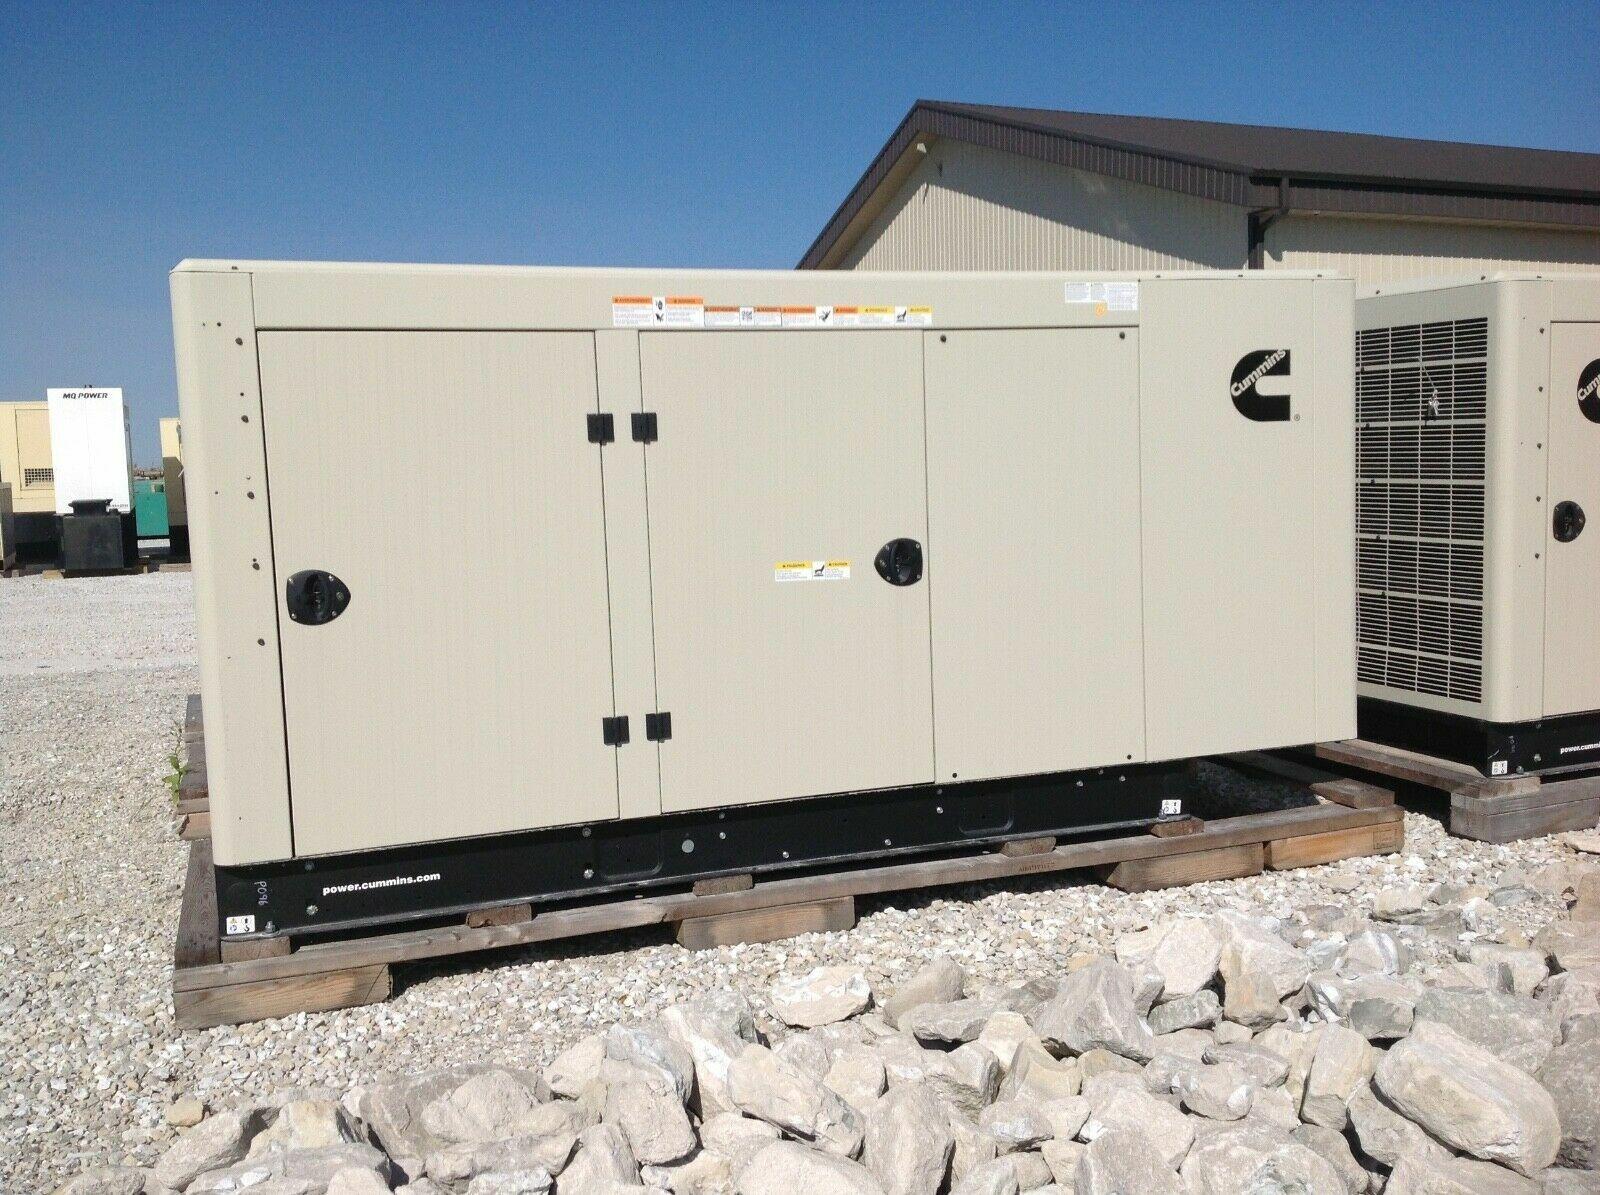 New Cummins Onan RS Series 50kW Natural Gas/Propane RS50 Liquid Cooled Generator